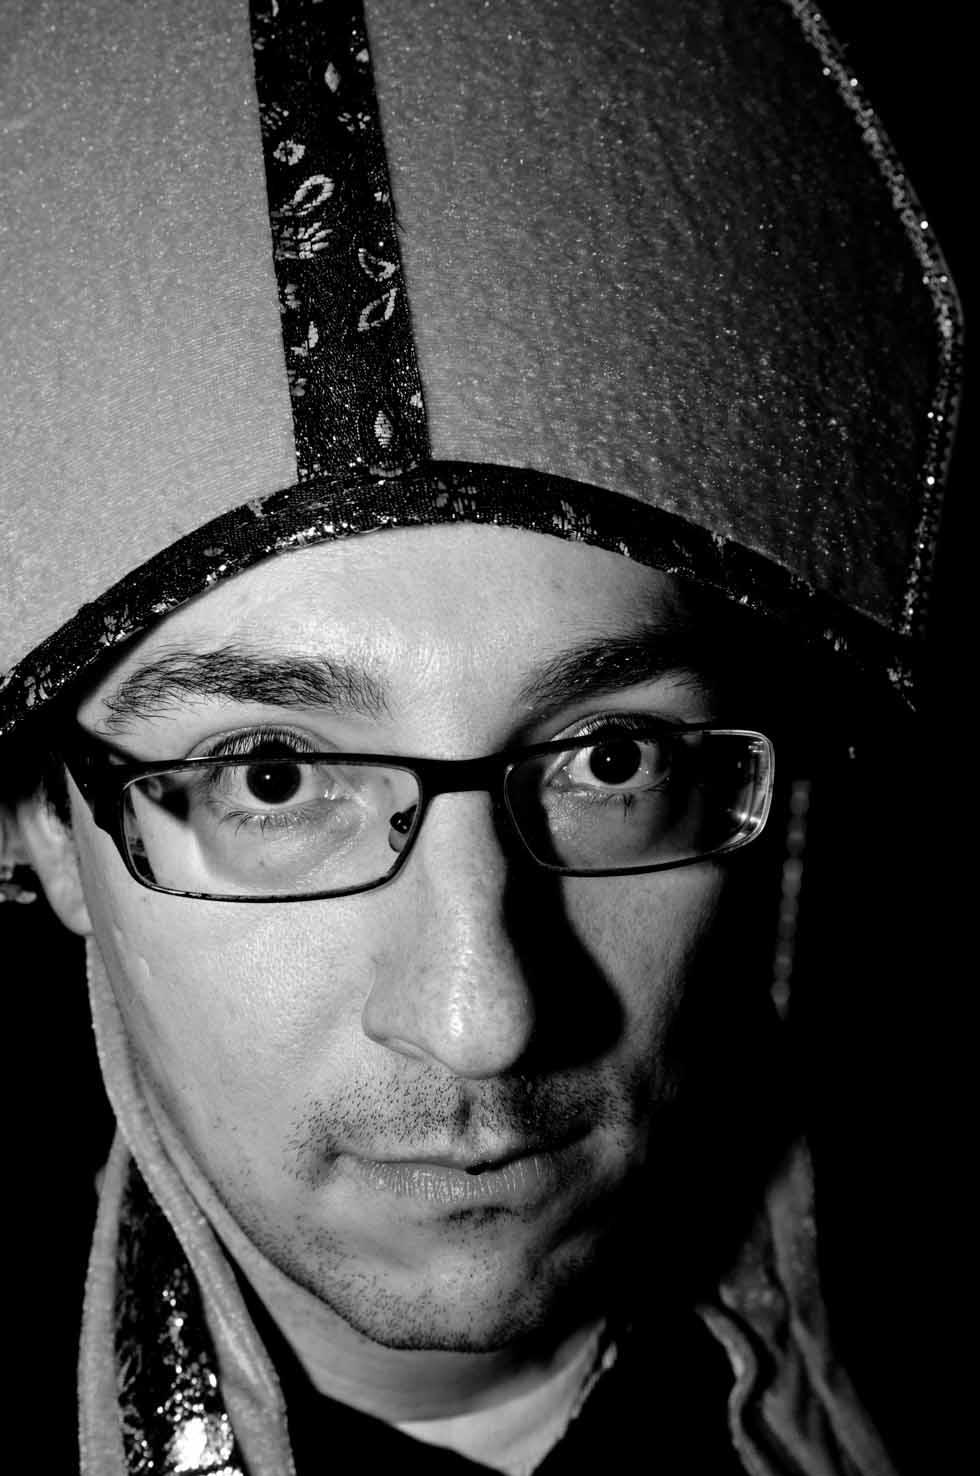 zum-schneider-nyc-2012-karneval-apocalyptika-4995.jpg